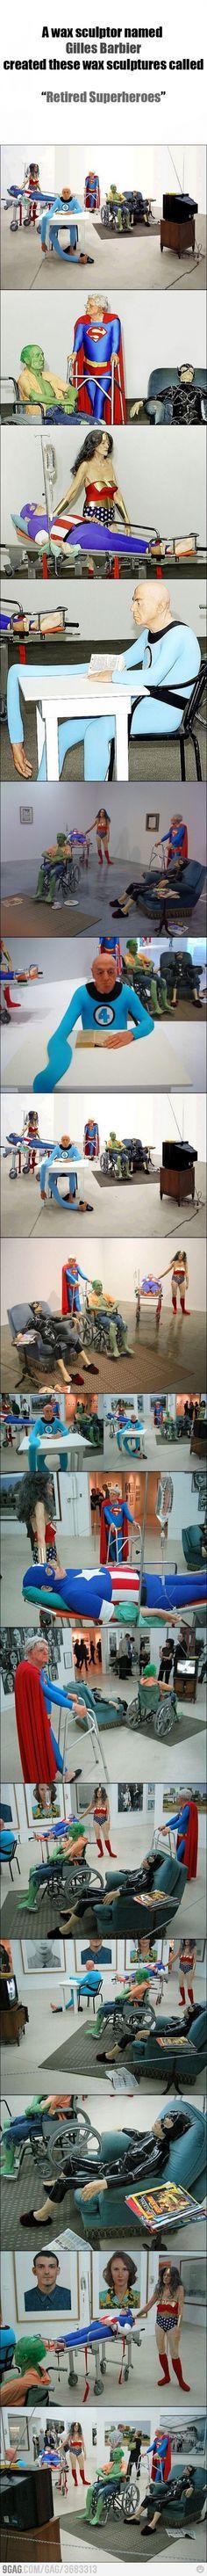 Retired Superheroes!  LOL @ Wonder Womans boobs!  HA HA HA!!!